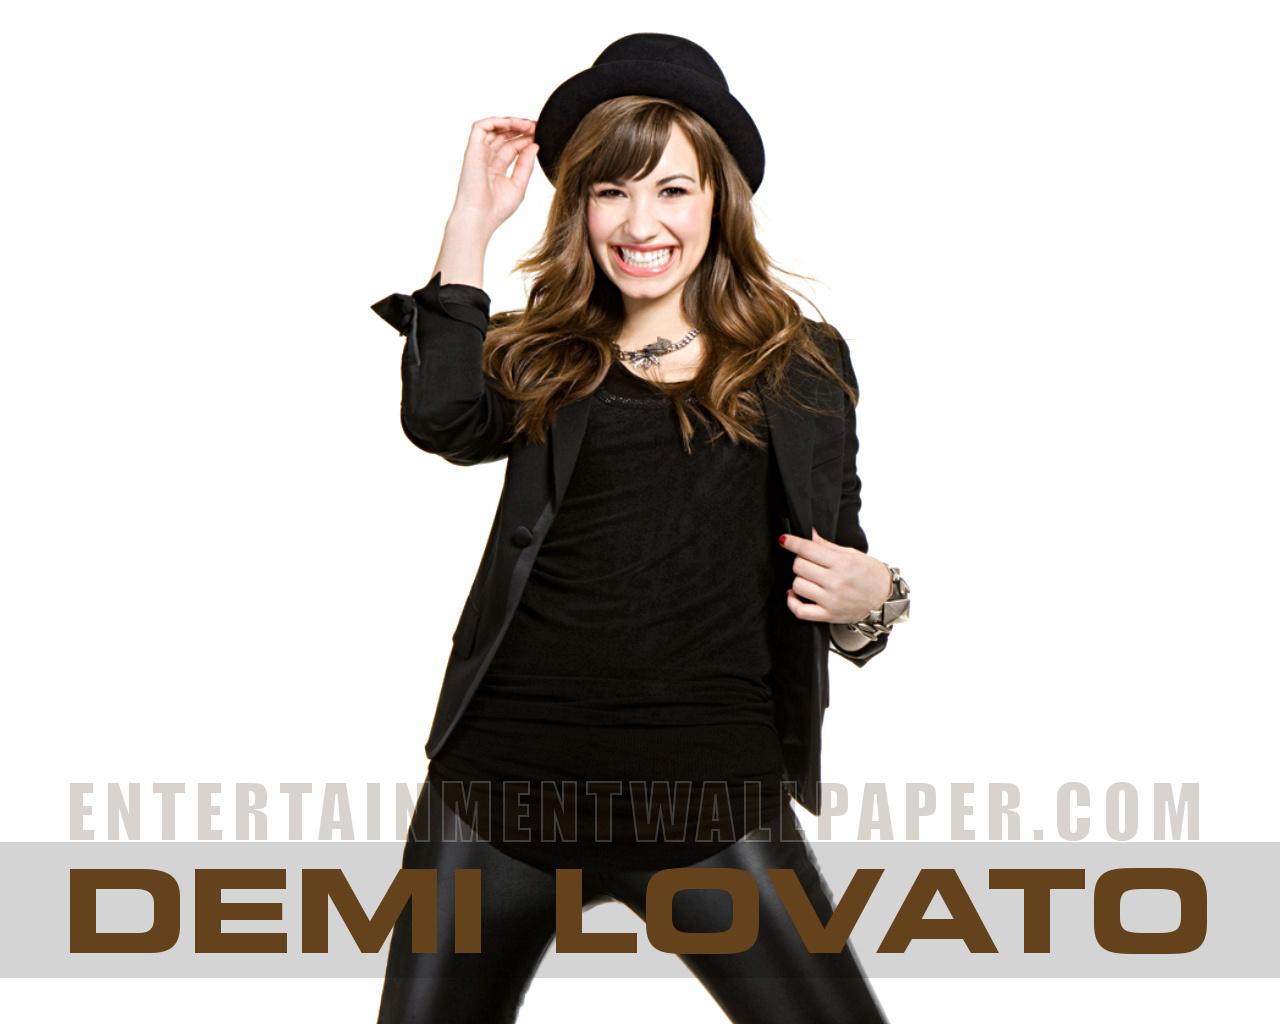 http://2.bp.blogspot.com/-GnN3JMpZ5sk/TrtWphwVqkI/AAAAAAAAAMM/i-ajC9khEgk/s1600/Demi+Lovato+Wallpaper+%25288%2529.jpg